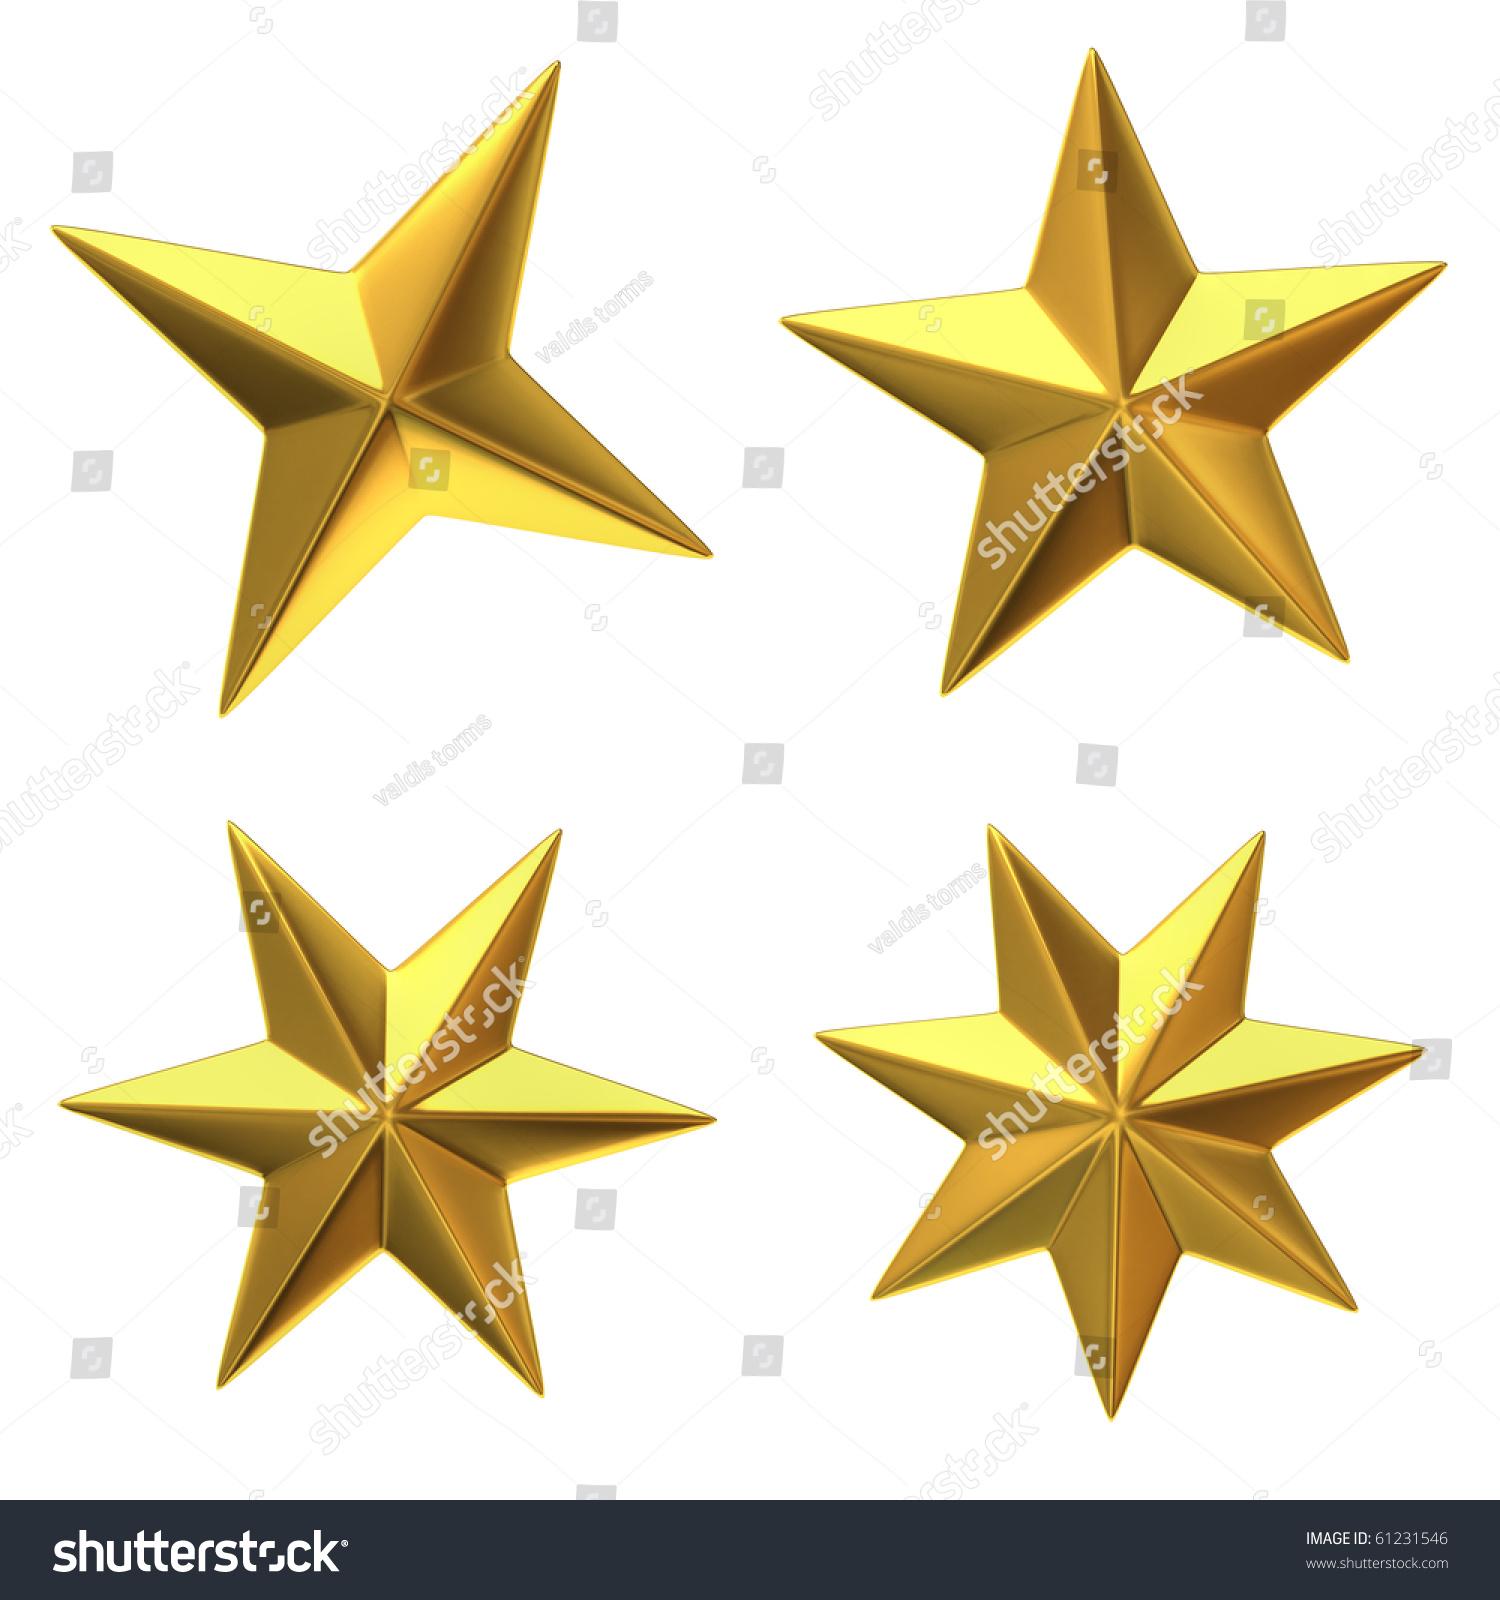 Gold Stars Stock Illustration 61231546 - Shutterstock - photo #14